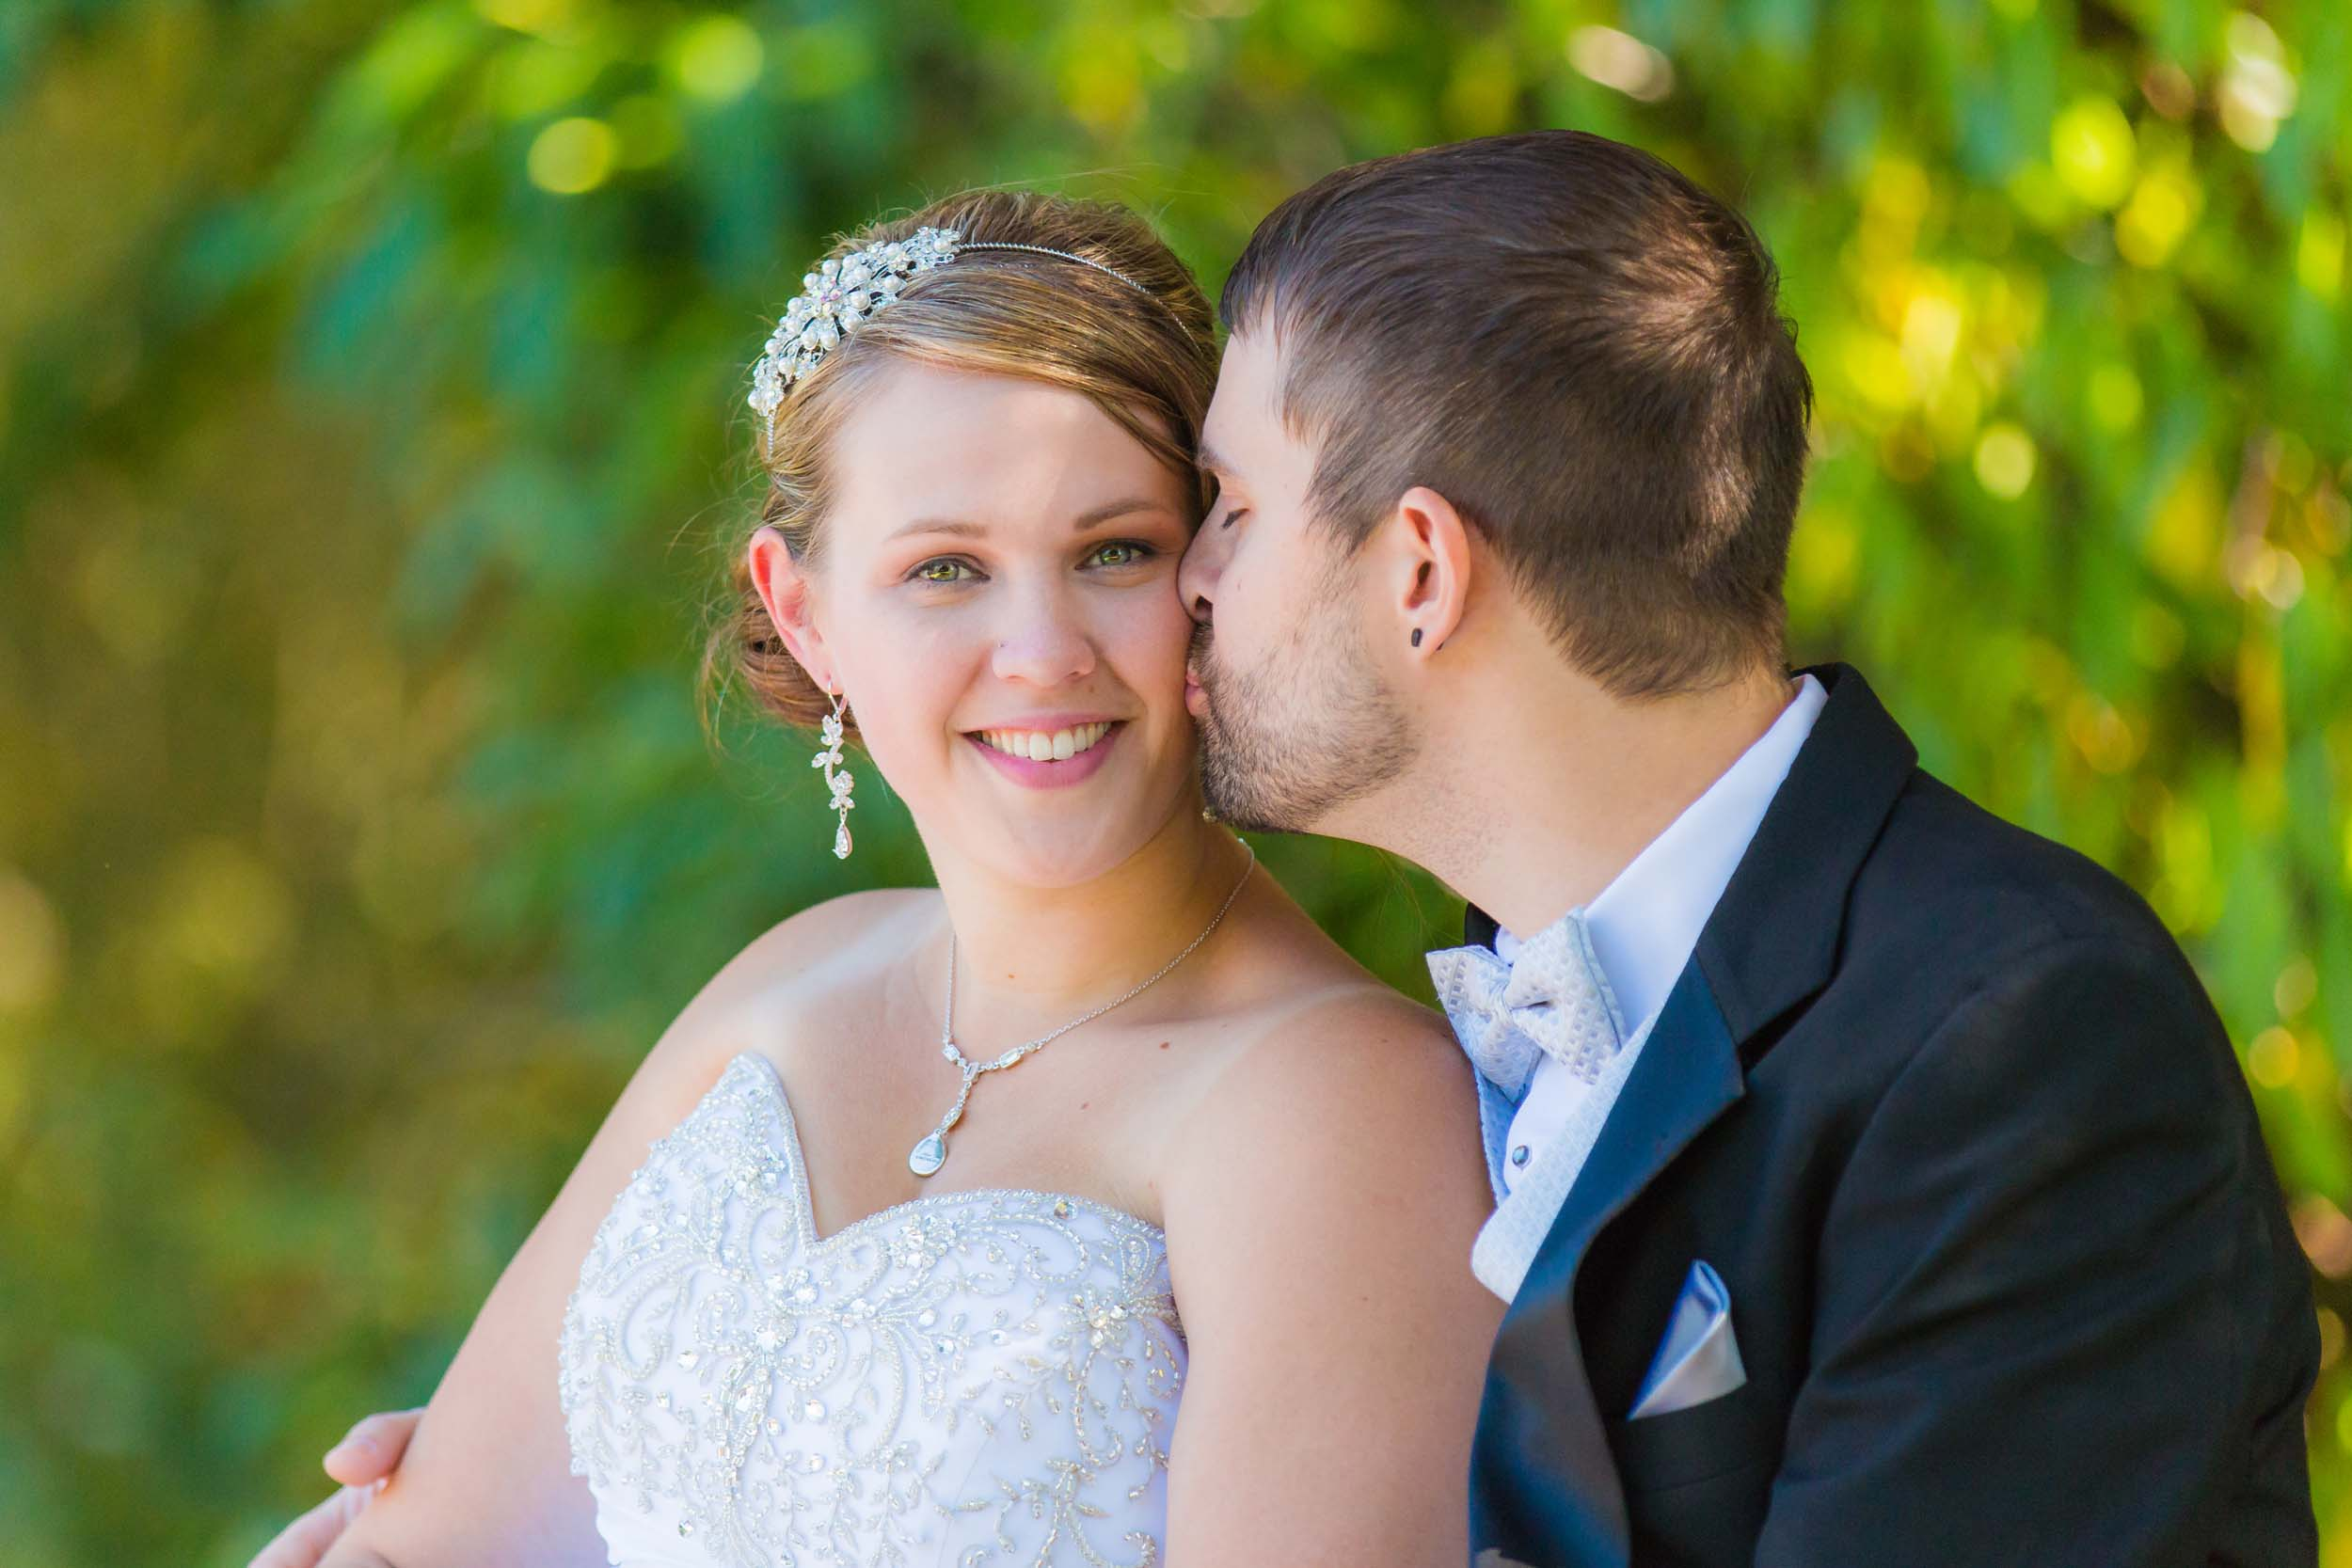 Aaron-Laura-Seattle-Wedding-Photography-464.jpg